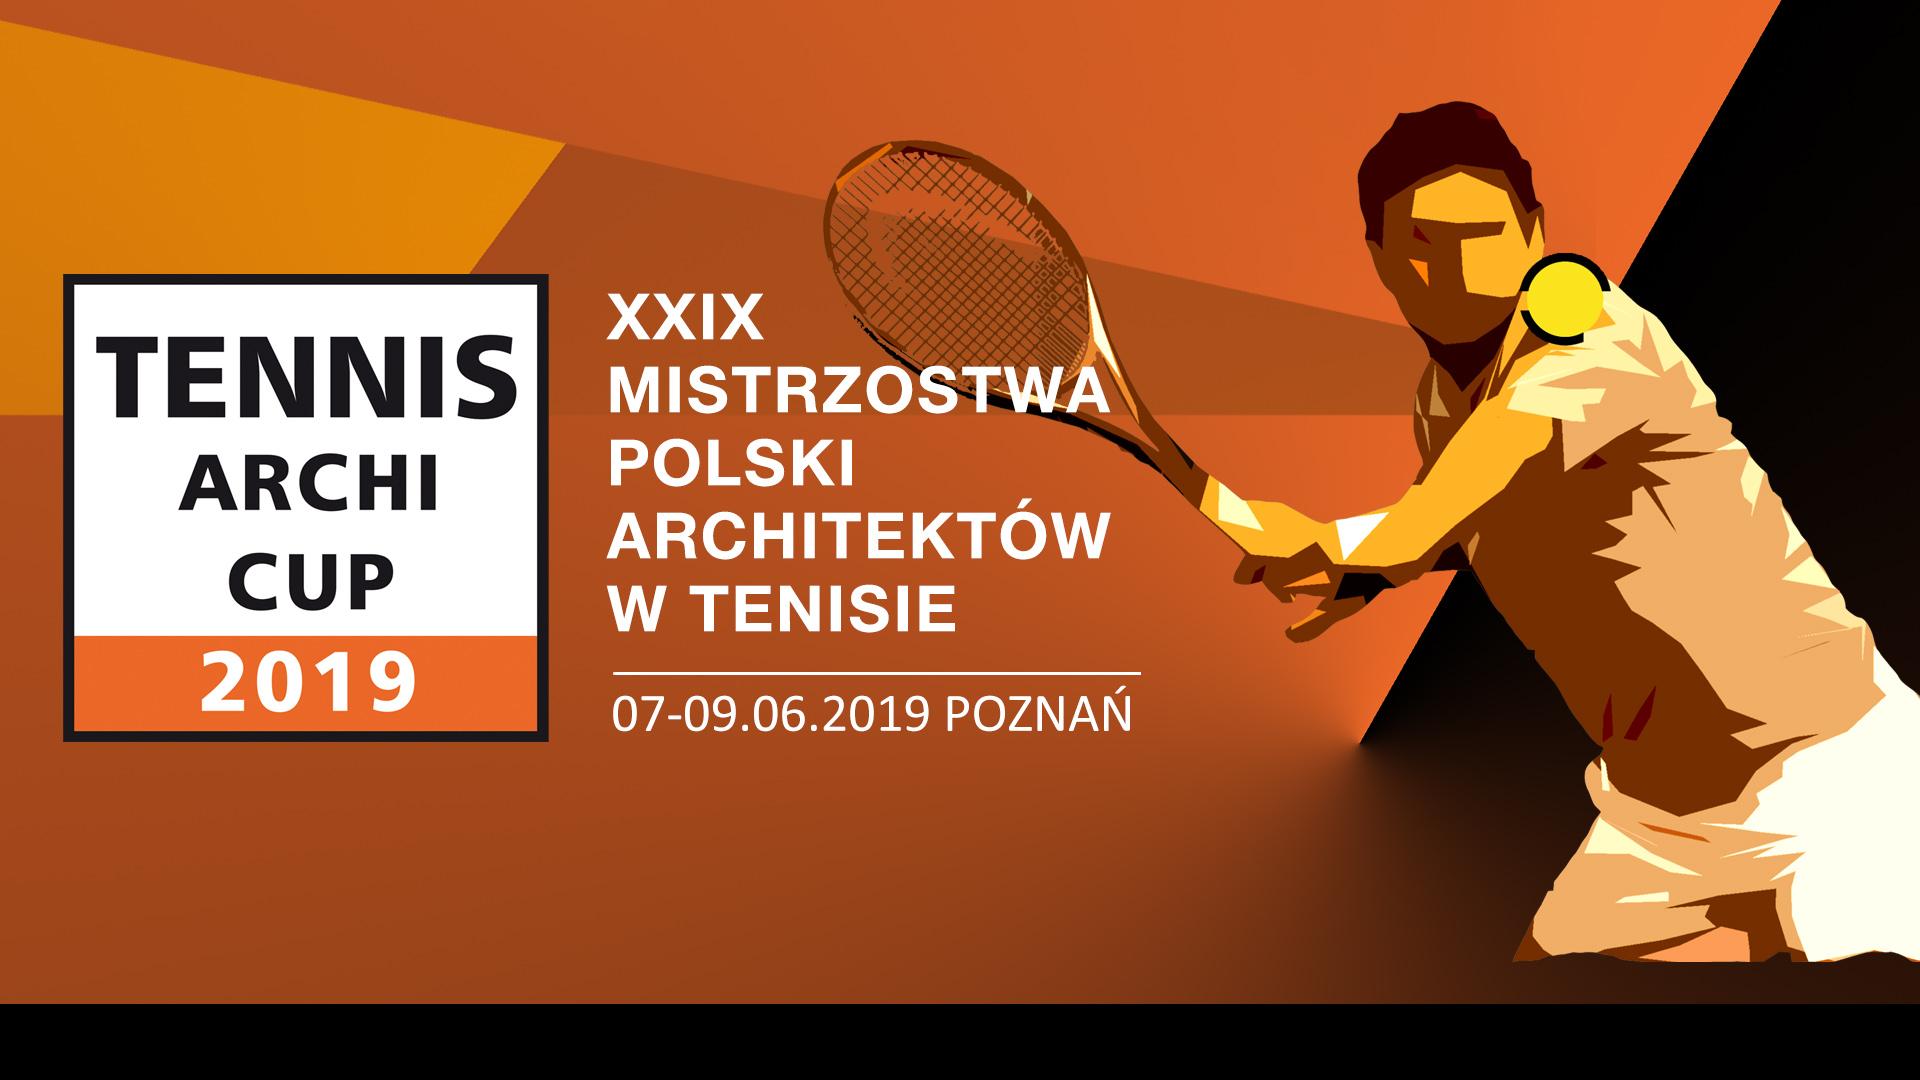 TENNIS ARCHI CUP 2019